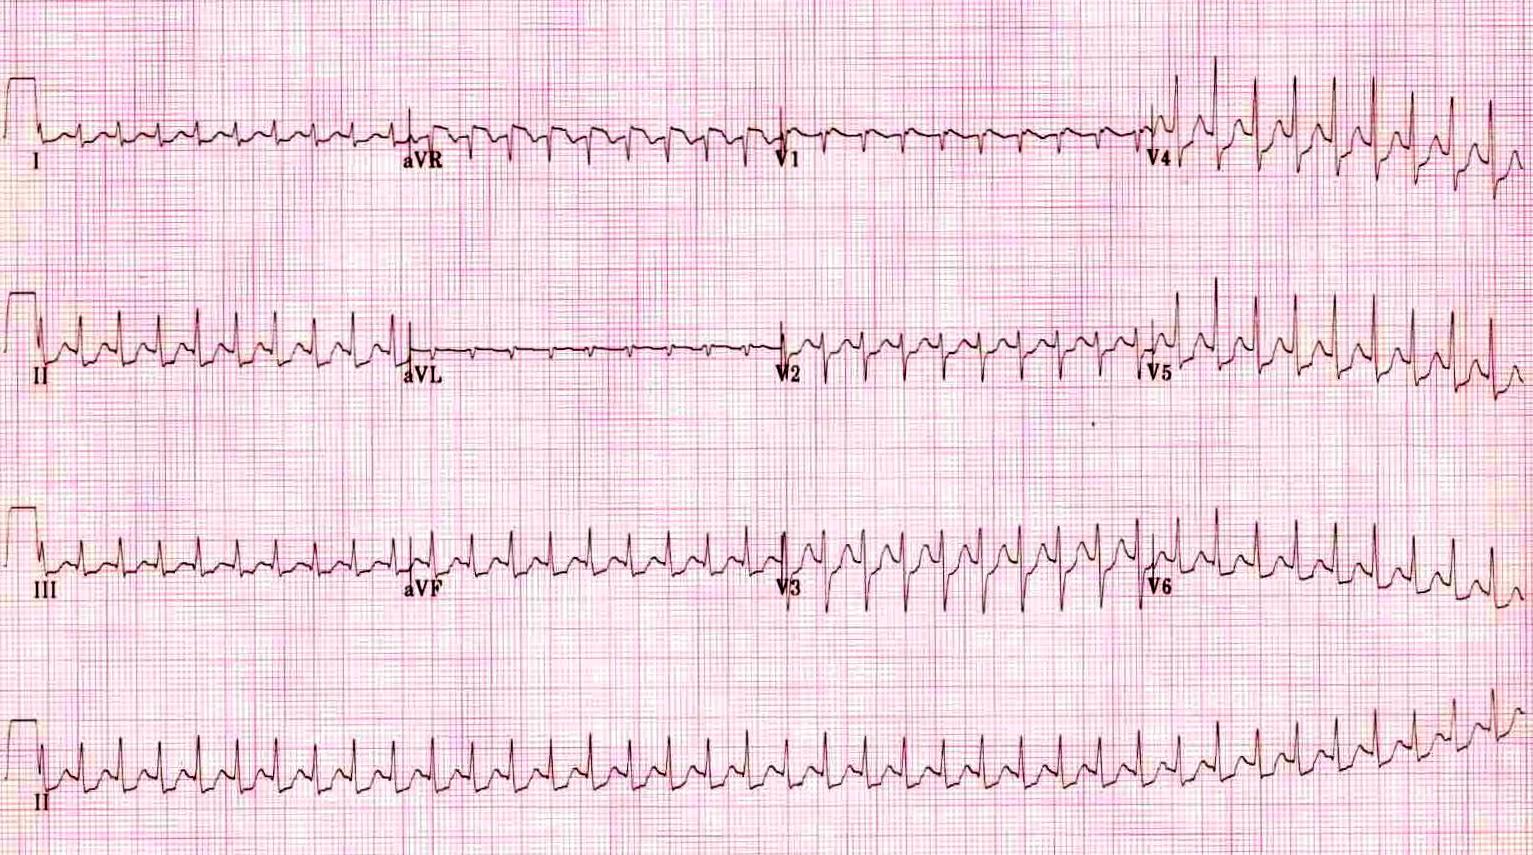 Paroxysmal Supraventricular Tachycardia Ecg Strip